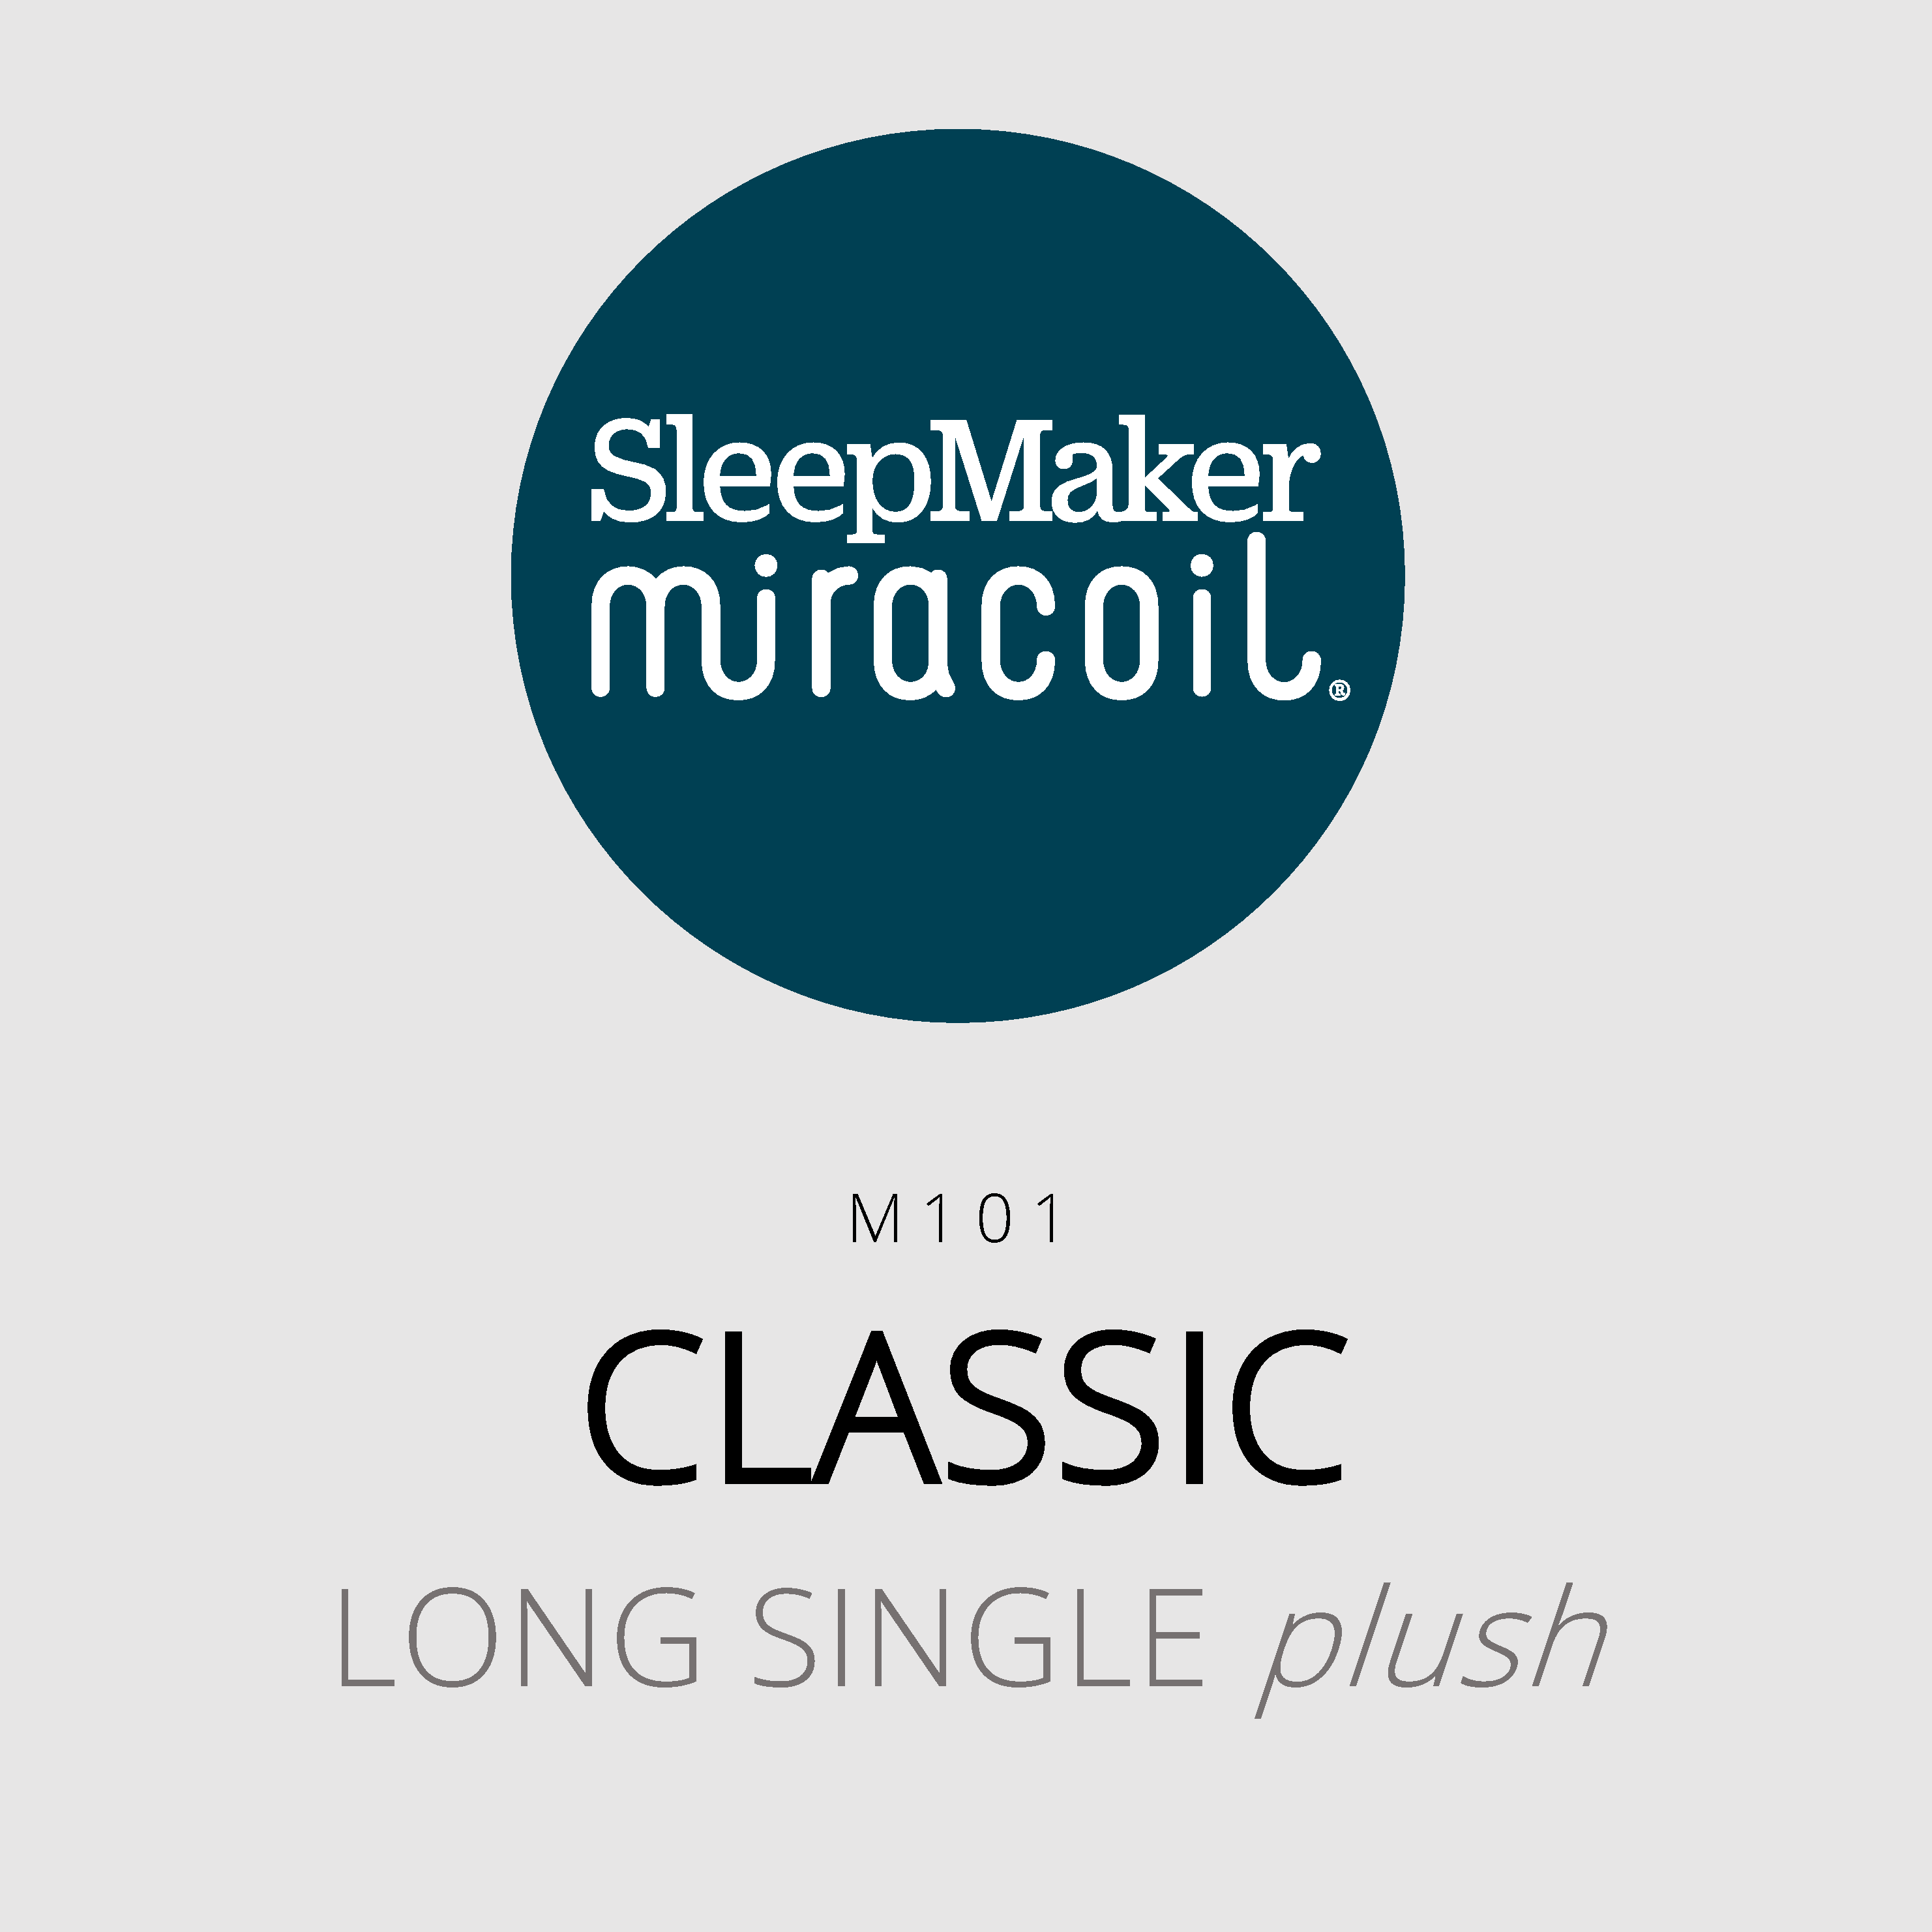 SleepMaker Miracoil – Classic – M101 – Long Single Plush Mattress